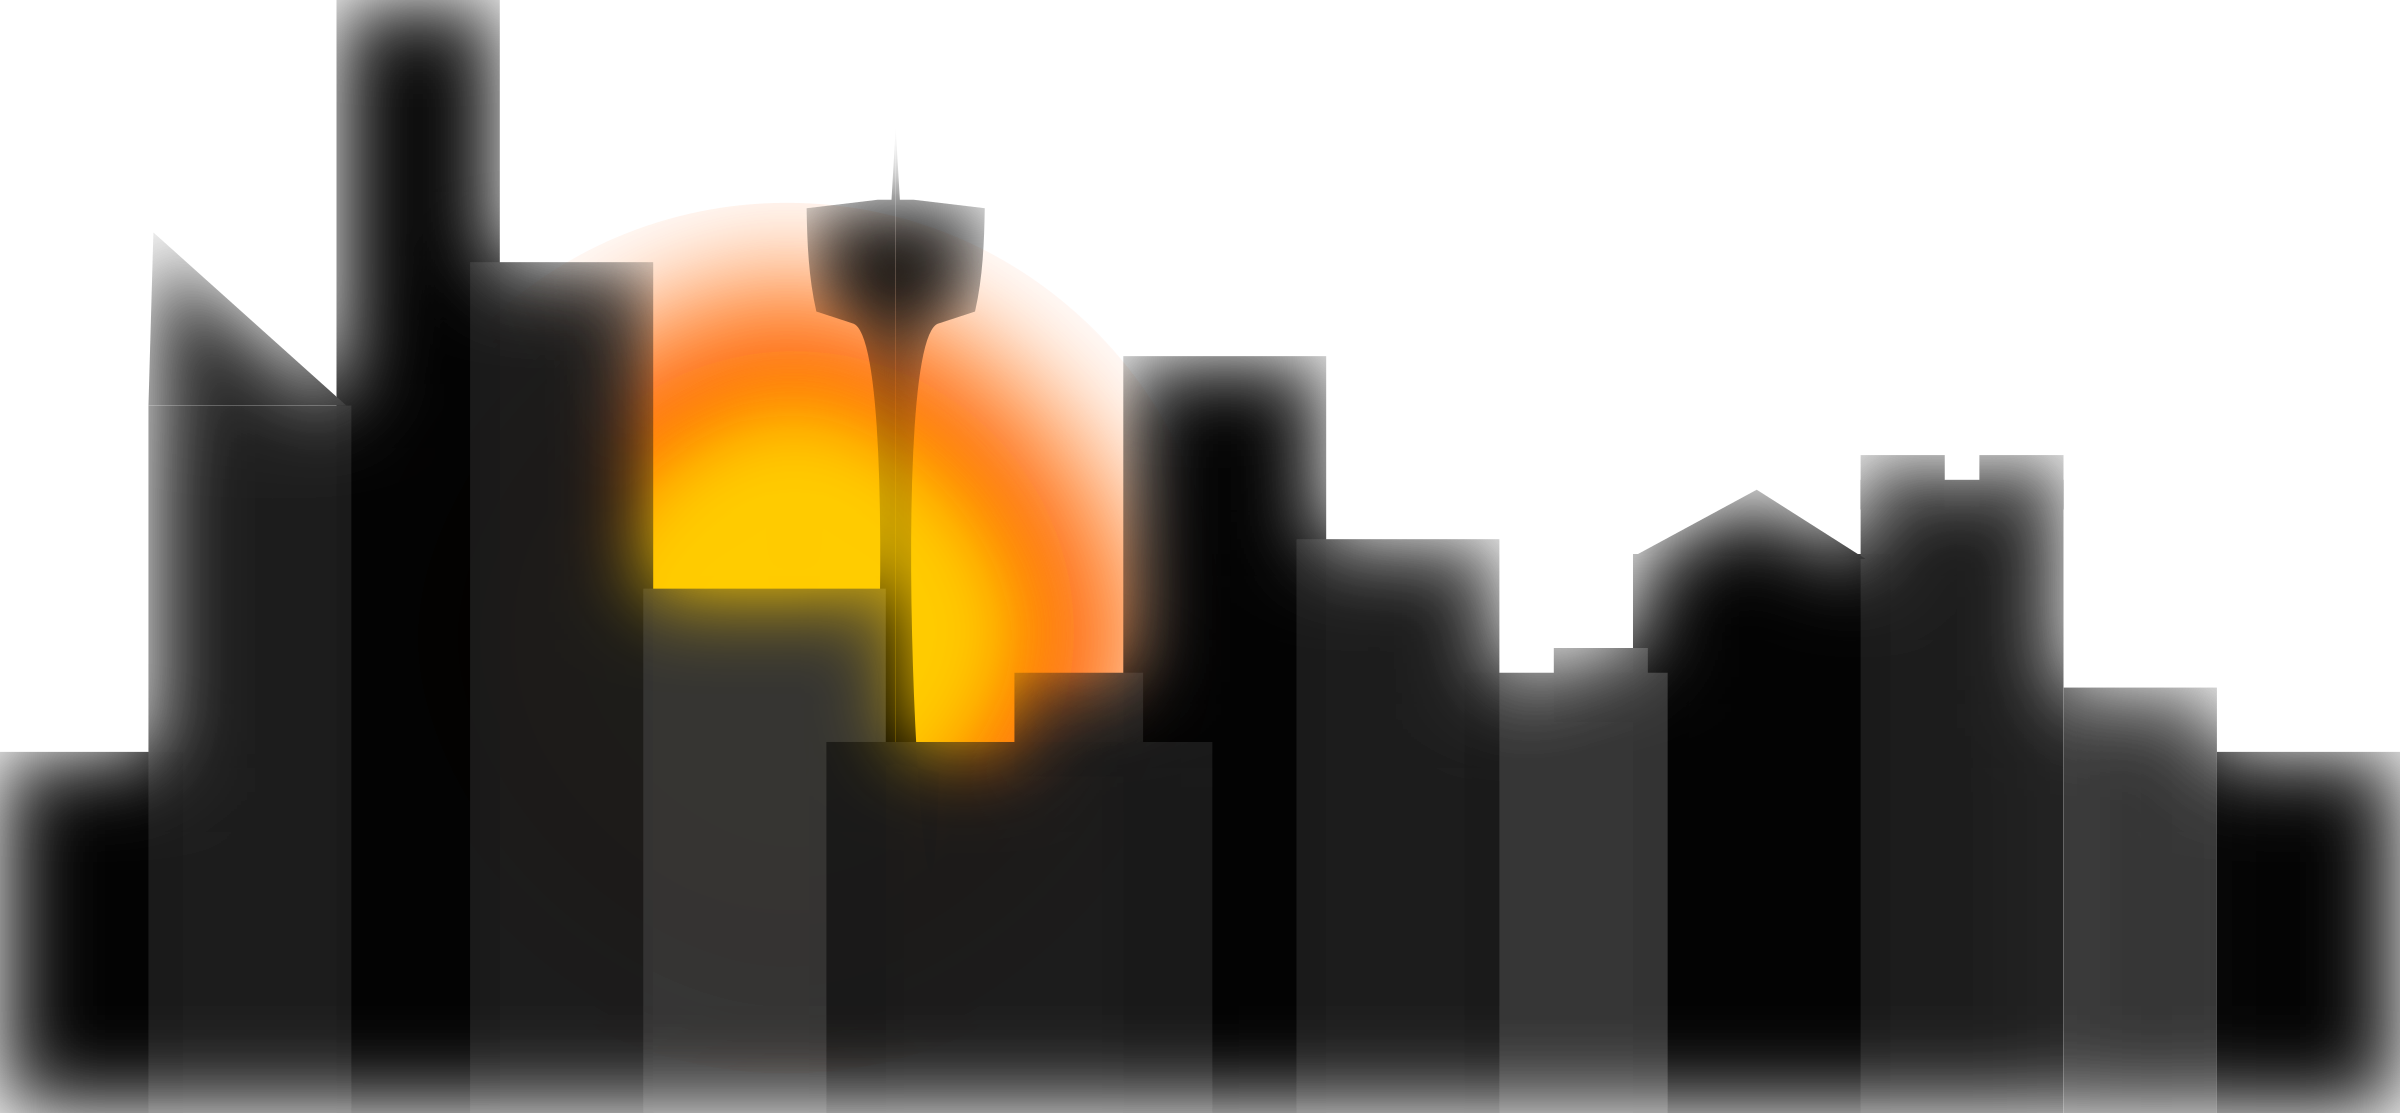 City big image png. Sunset clipart sunset sky